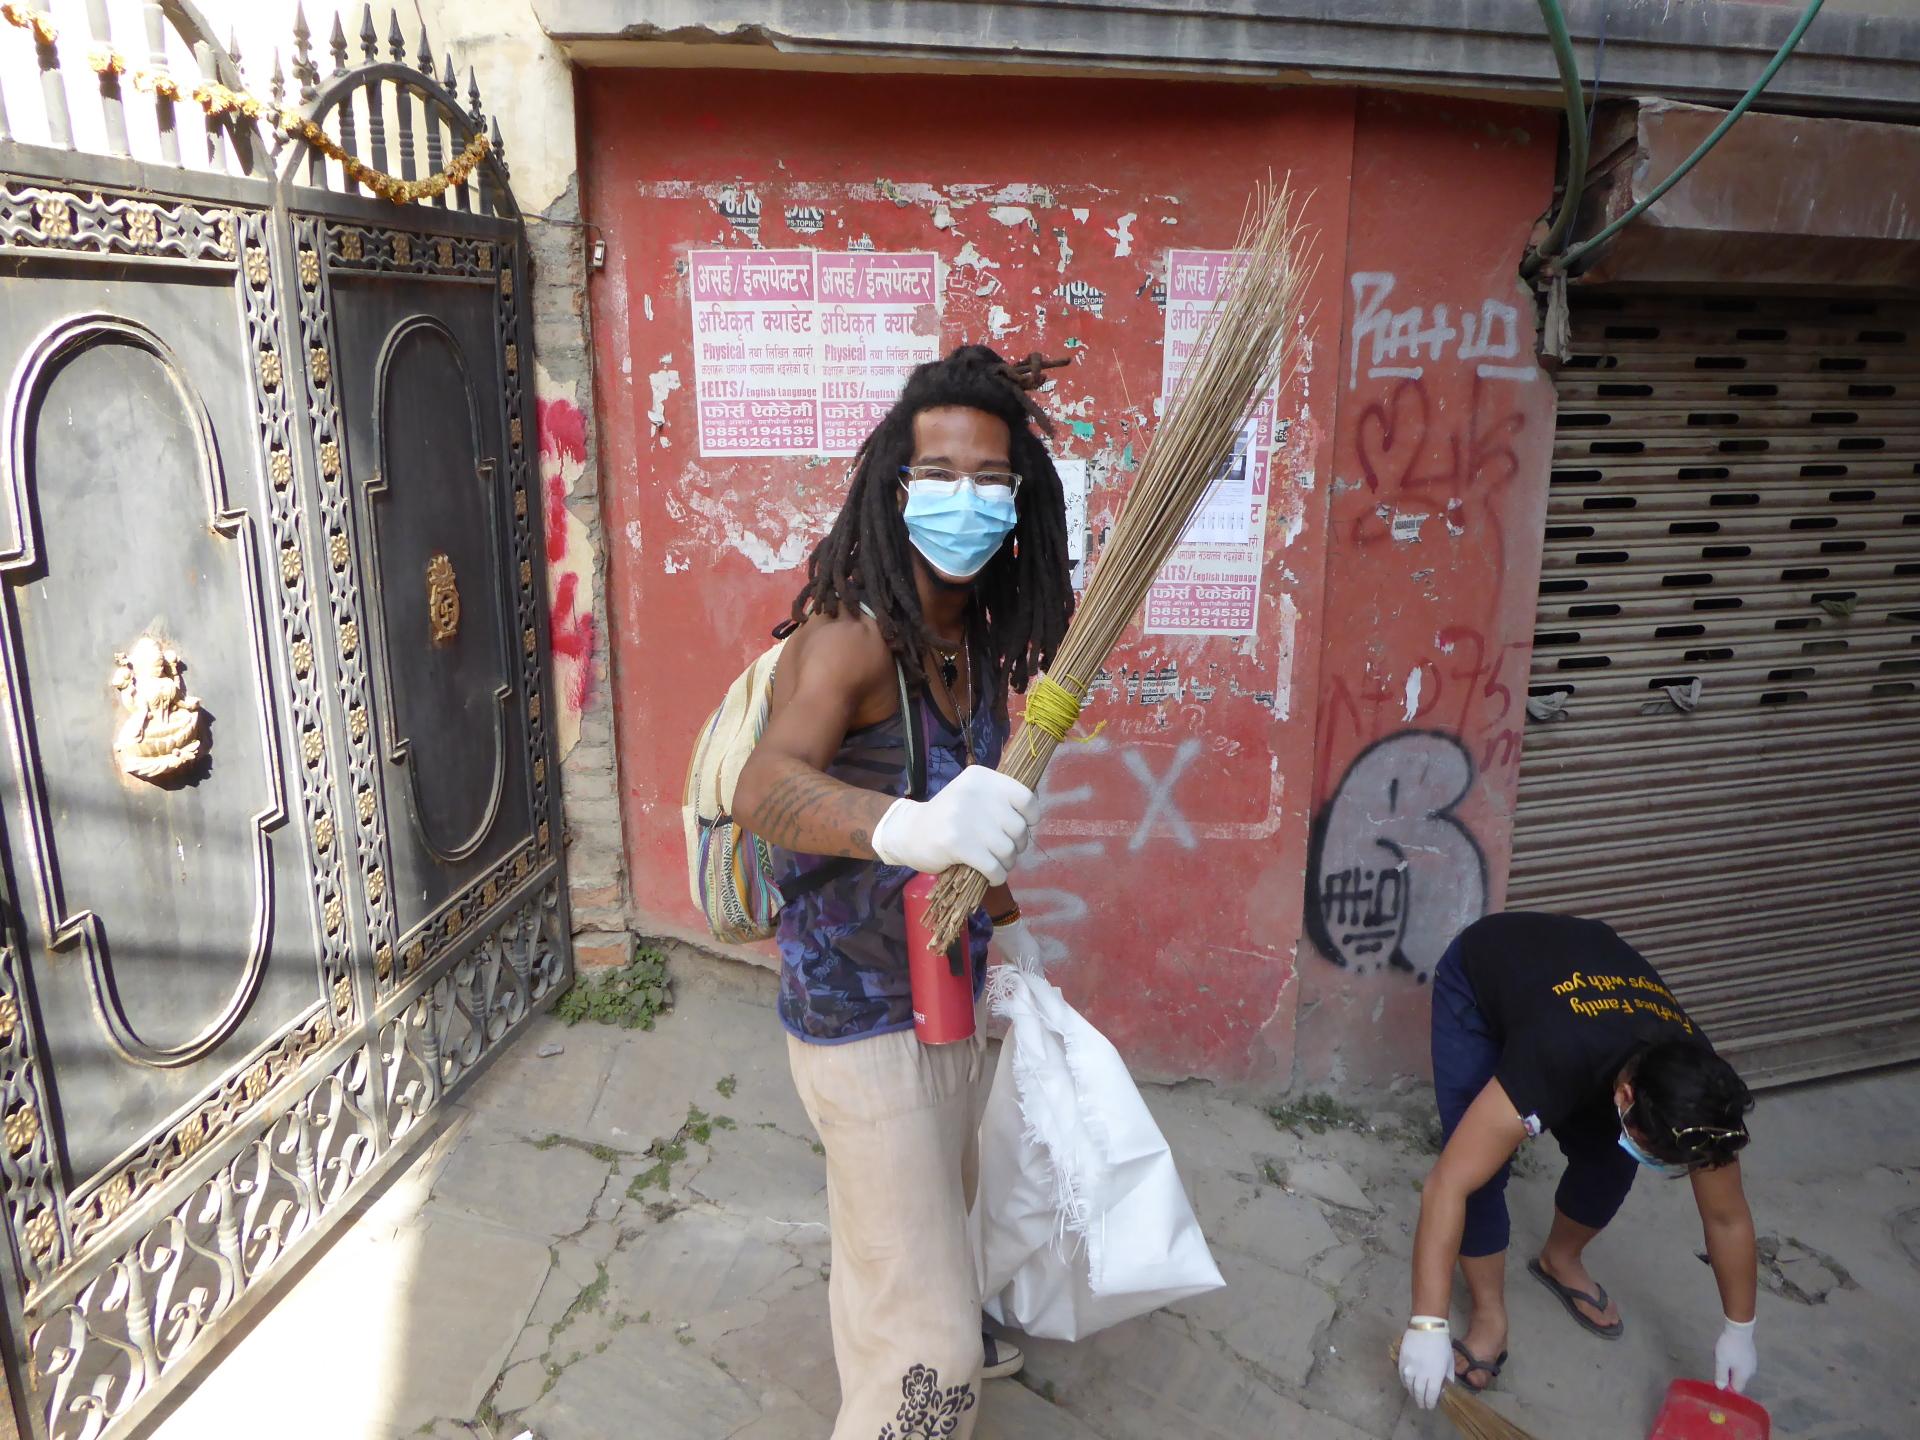 Street Cleaning Ninja